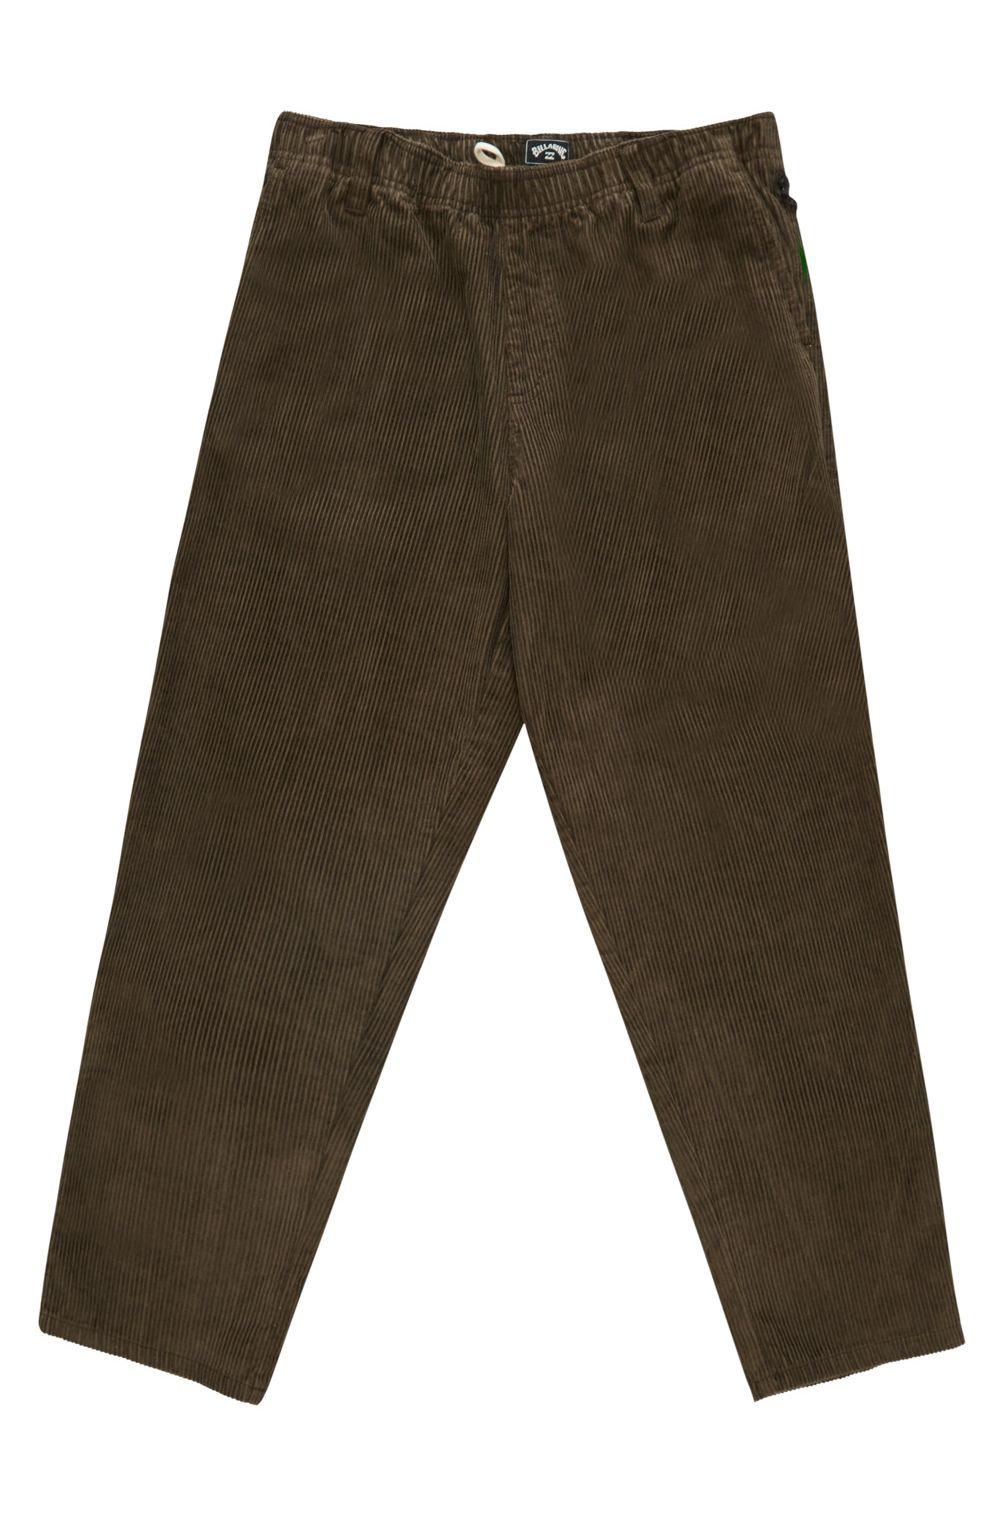 Billabong Pants BOWIE LAYBACK PANT WRANGLER. Coffee